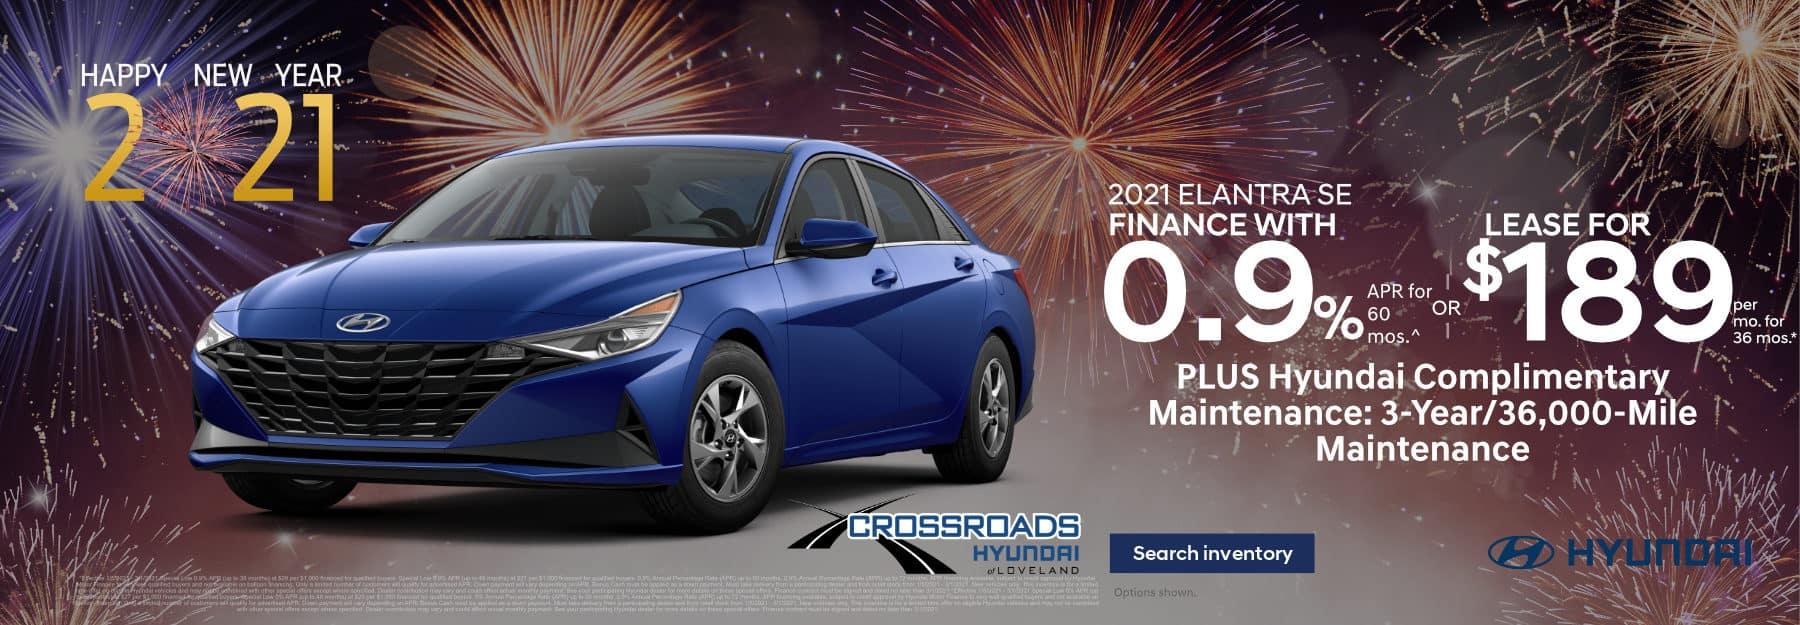 January_2021_Elantra_CROSSROADS_Hyundai